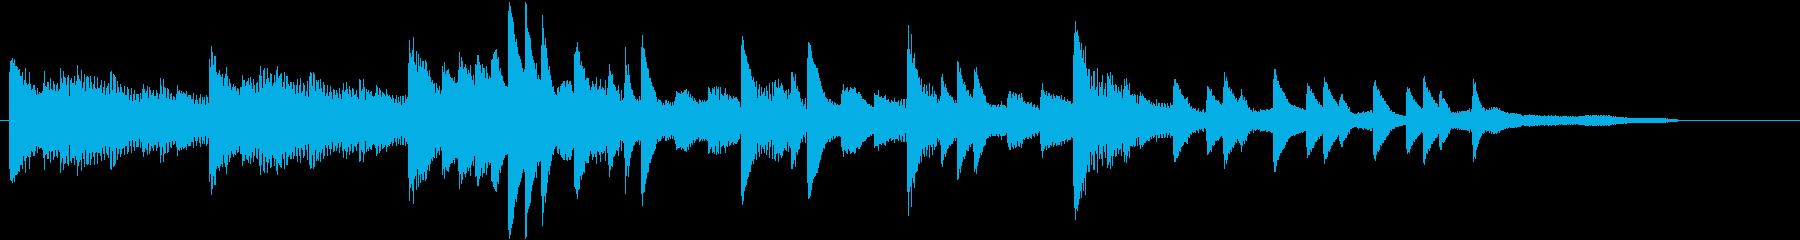 XmasキャロルオブザベルズジングルCの再生済みの波形